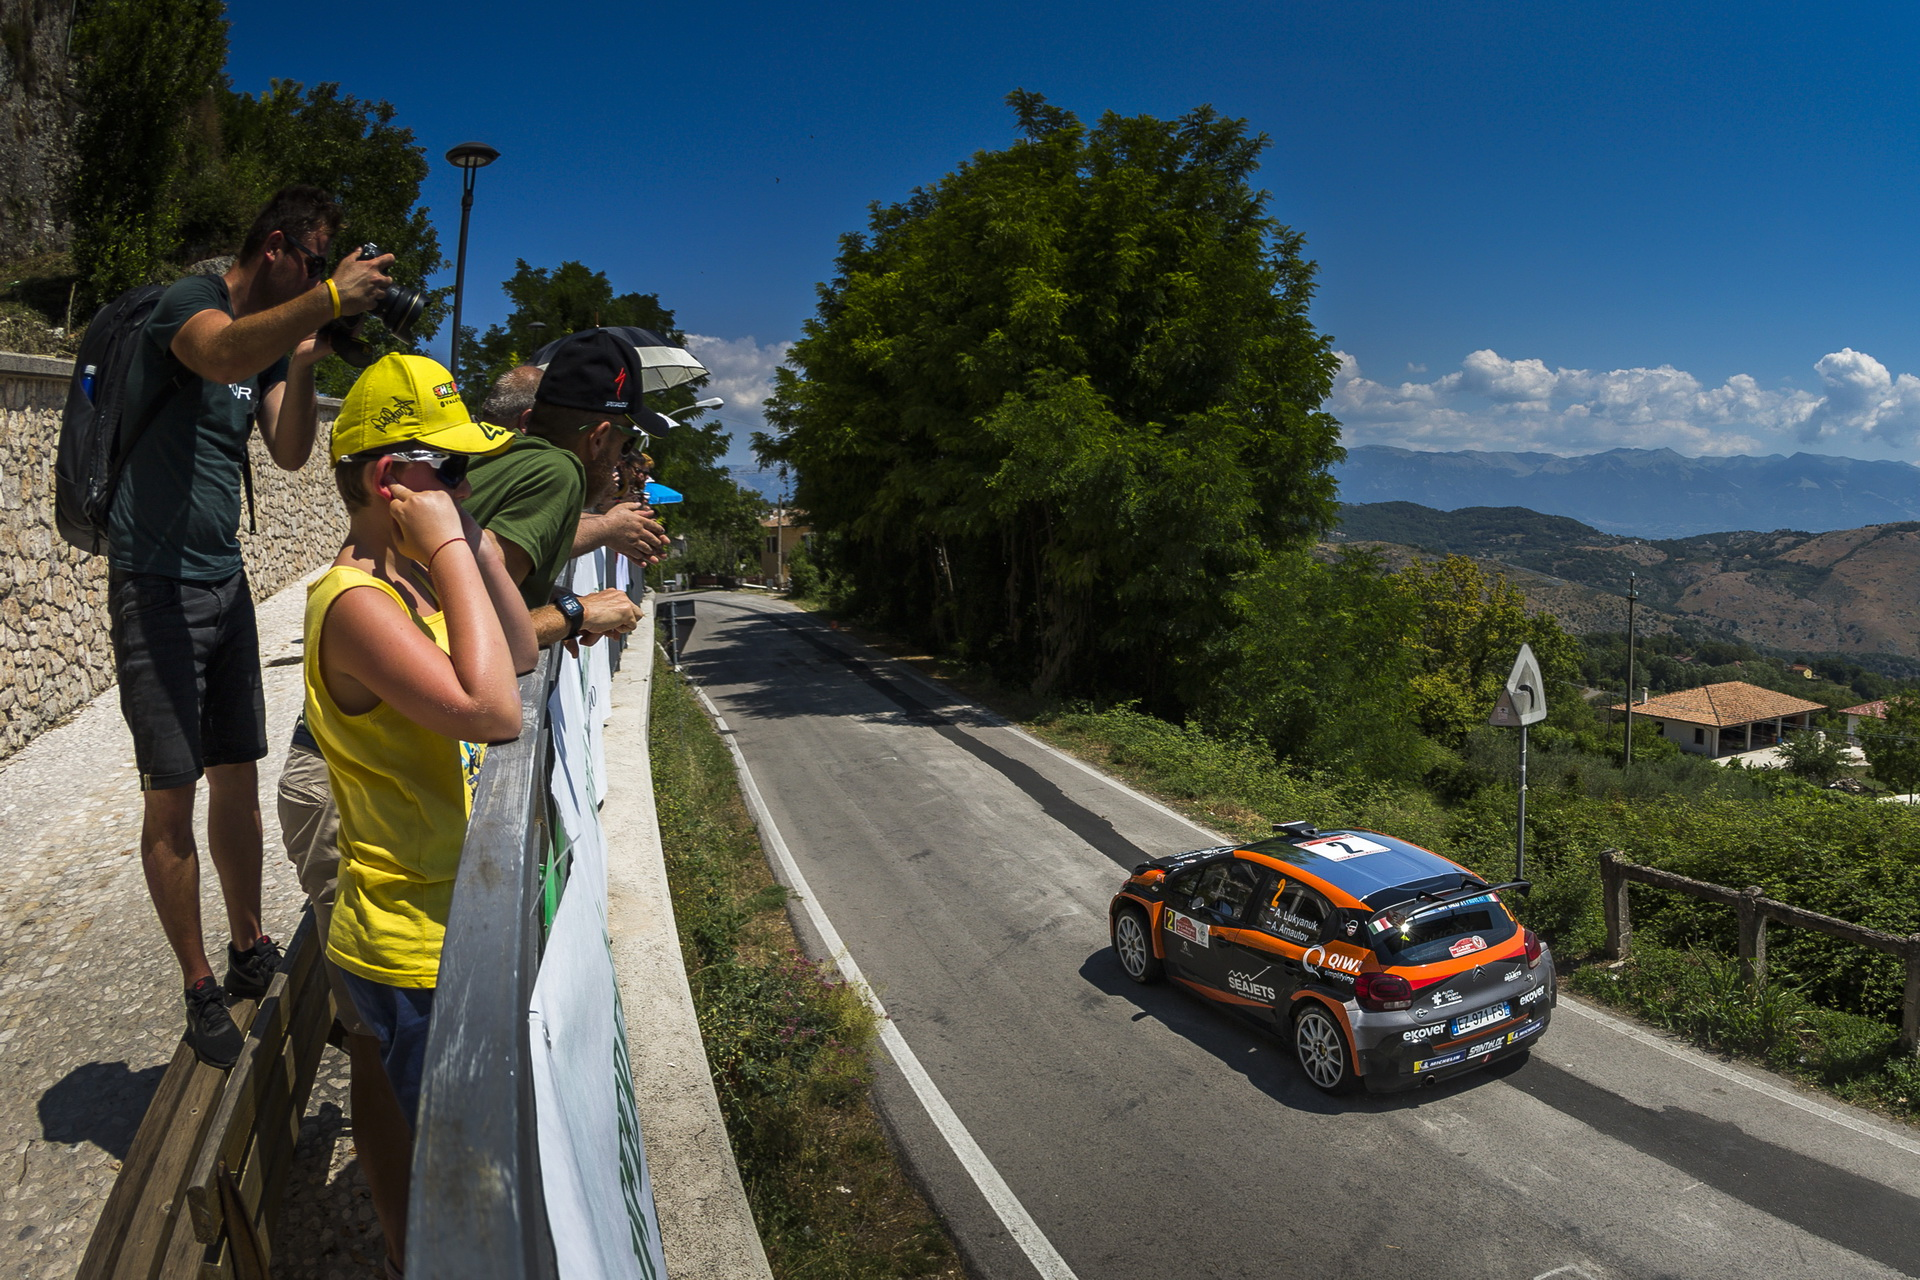 пятый этап чемпионата Европы по ралли. Rally di Roma Capitale